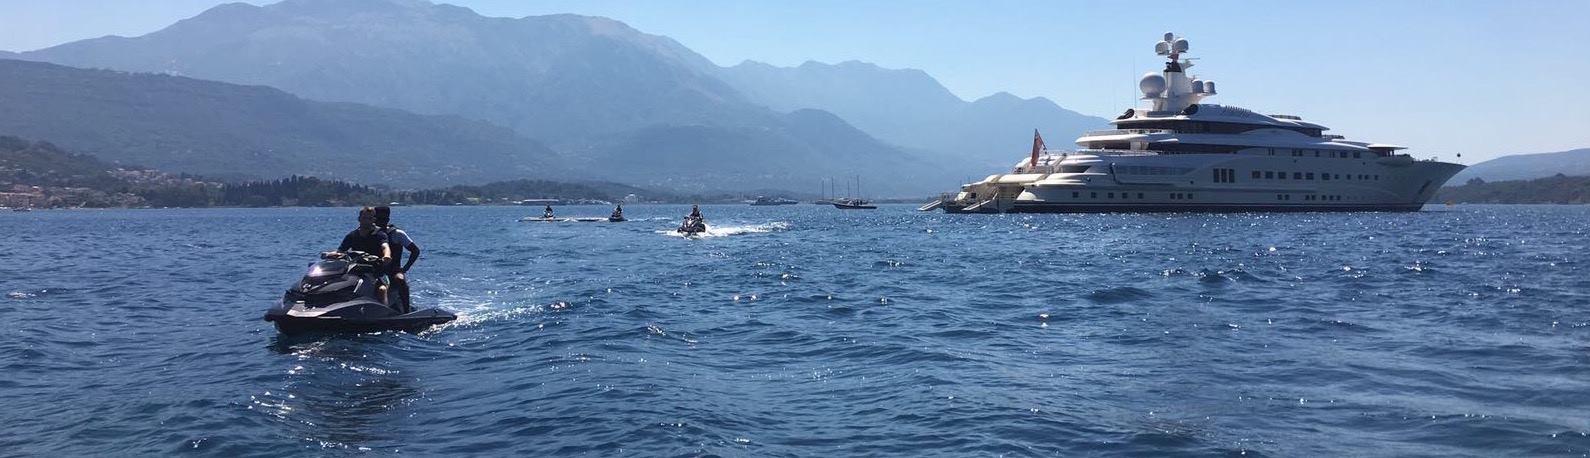 Onboard Crew RYA PWC Proficiency and Jetski Instructor Training at your location ©www.marine-education.eu